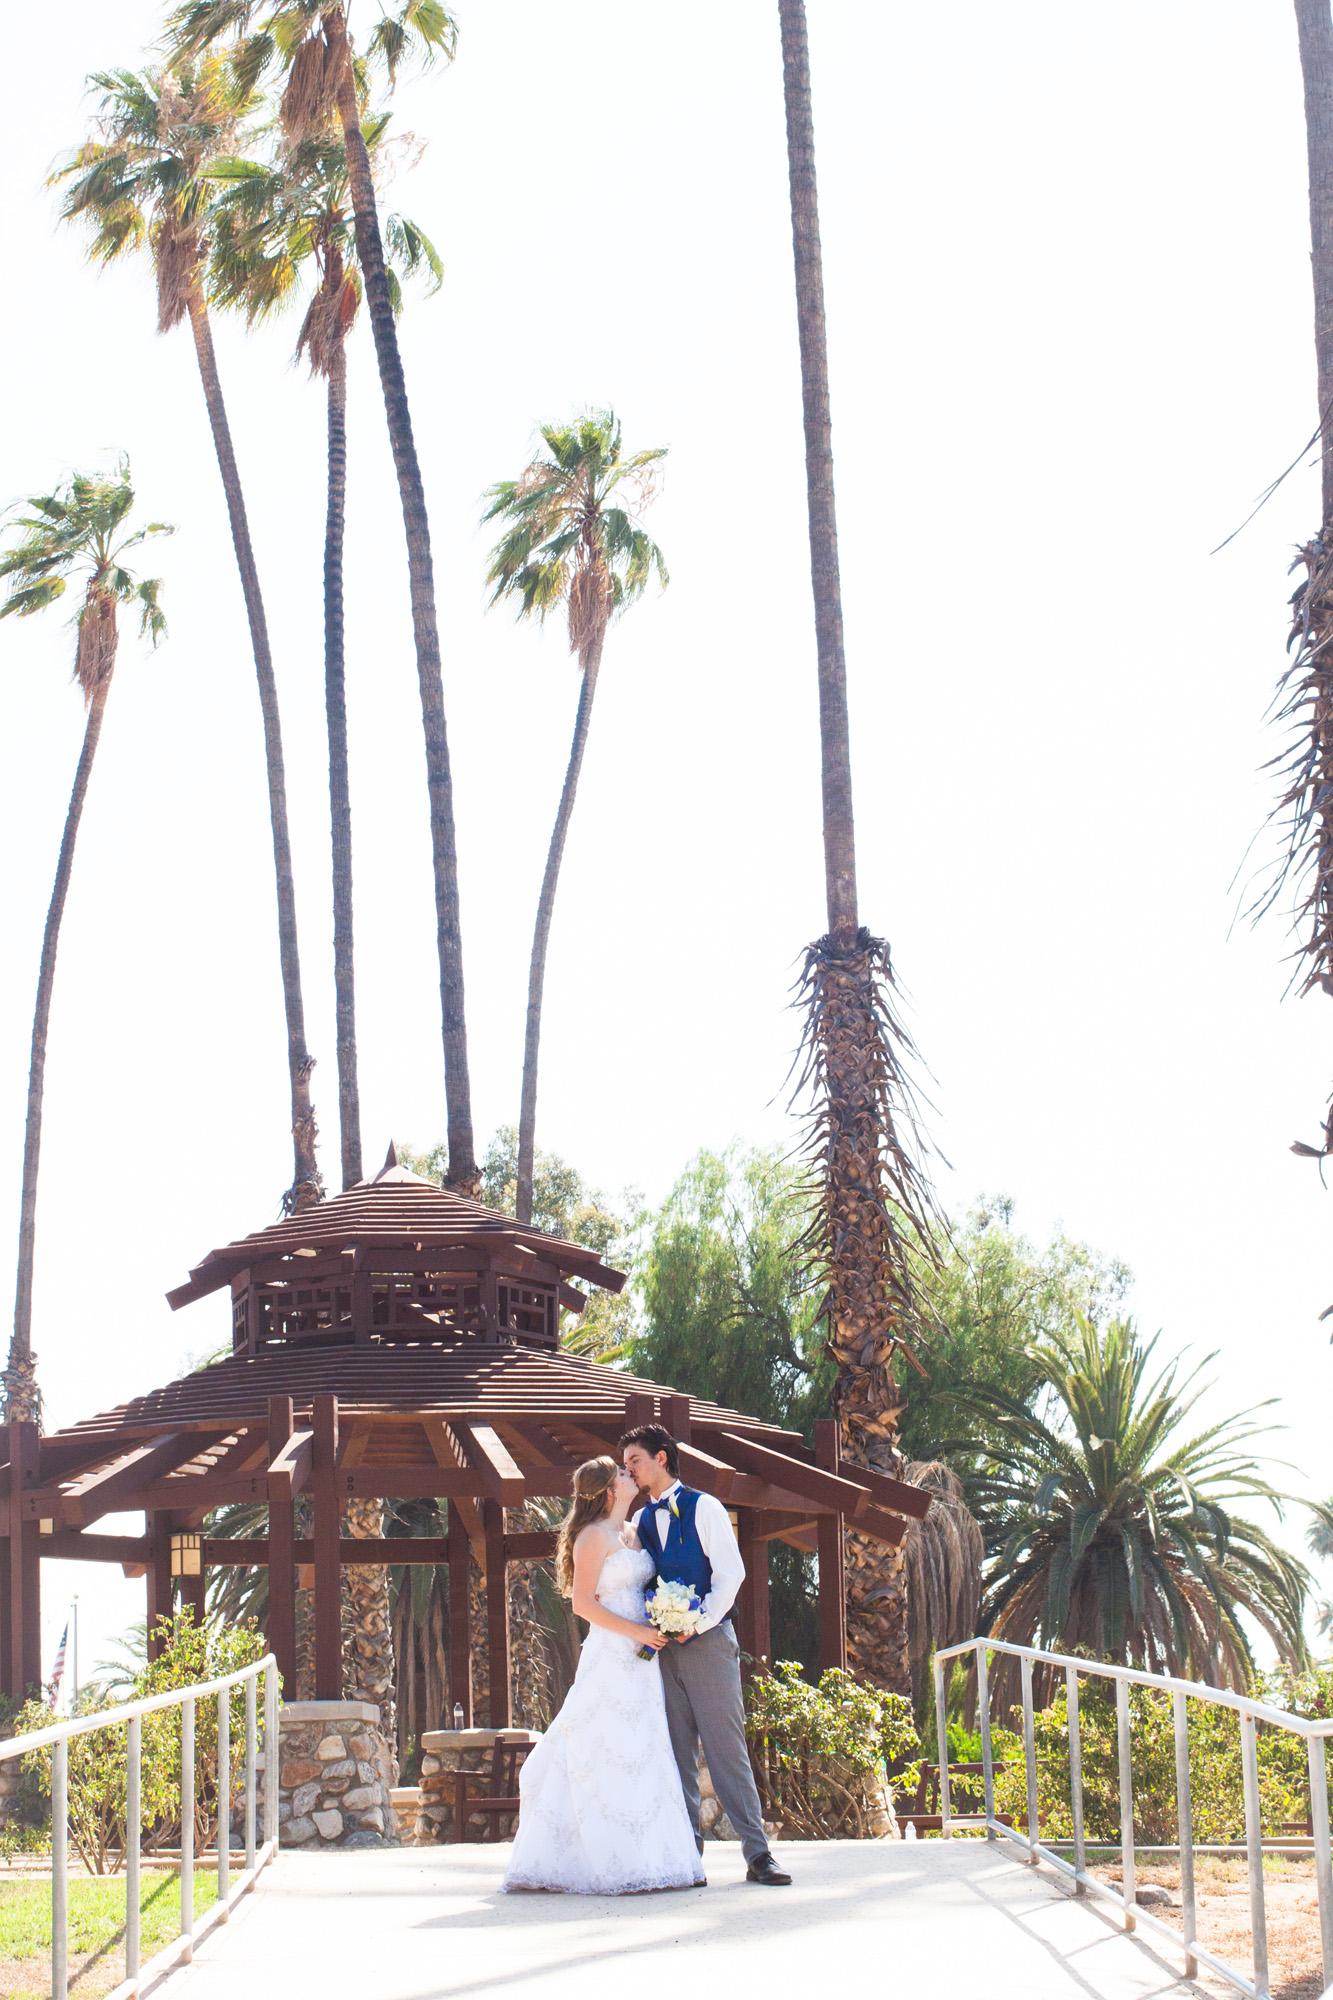 palm trees and gazebo wedding kiss